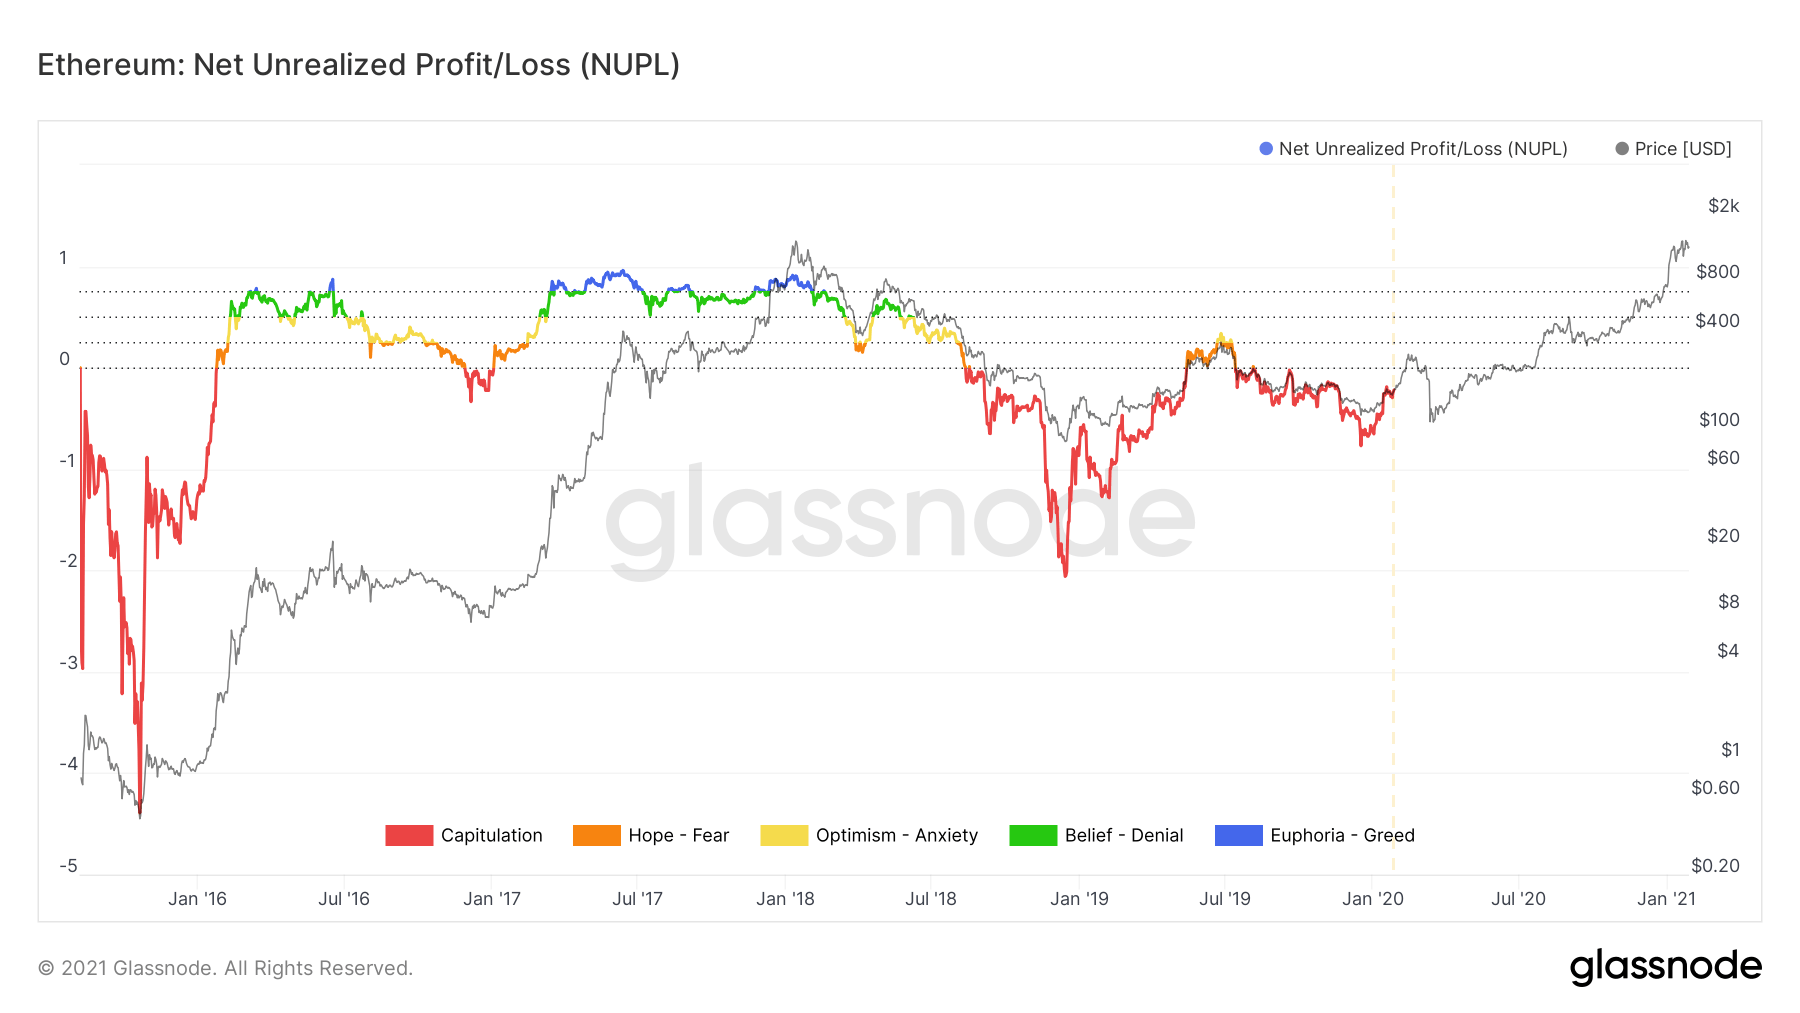 Ethereum NUPL chart